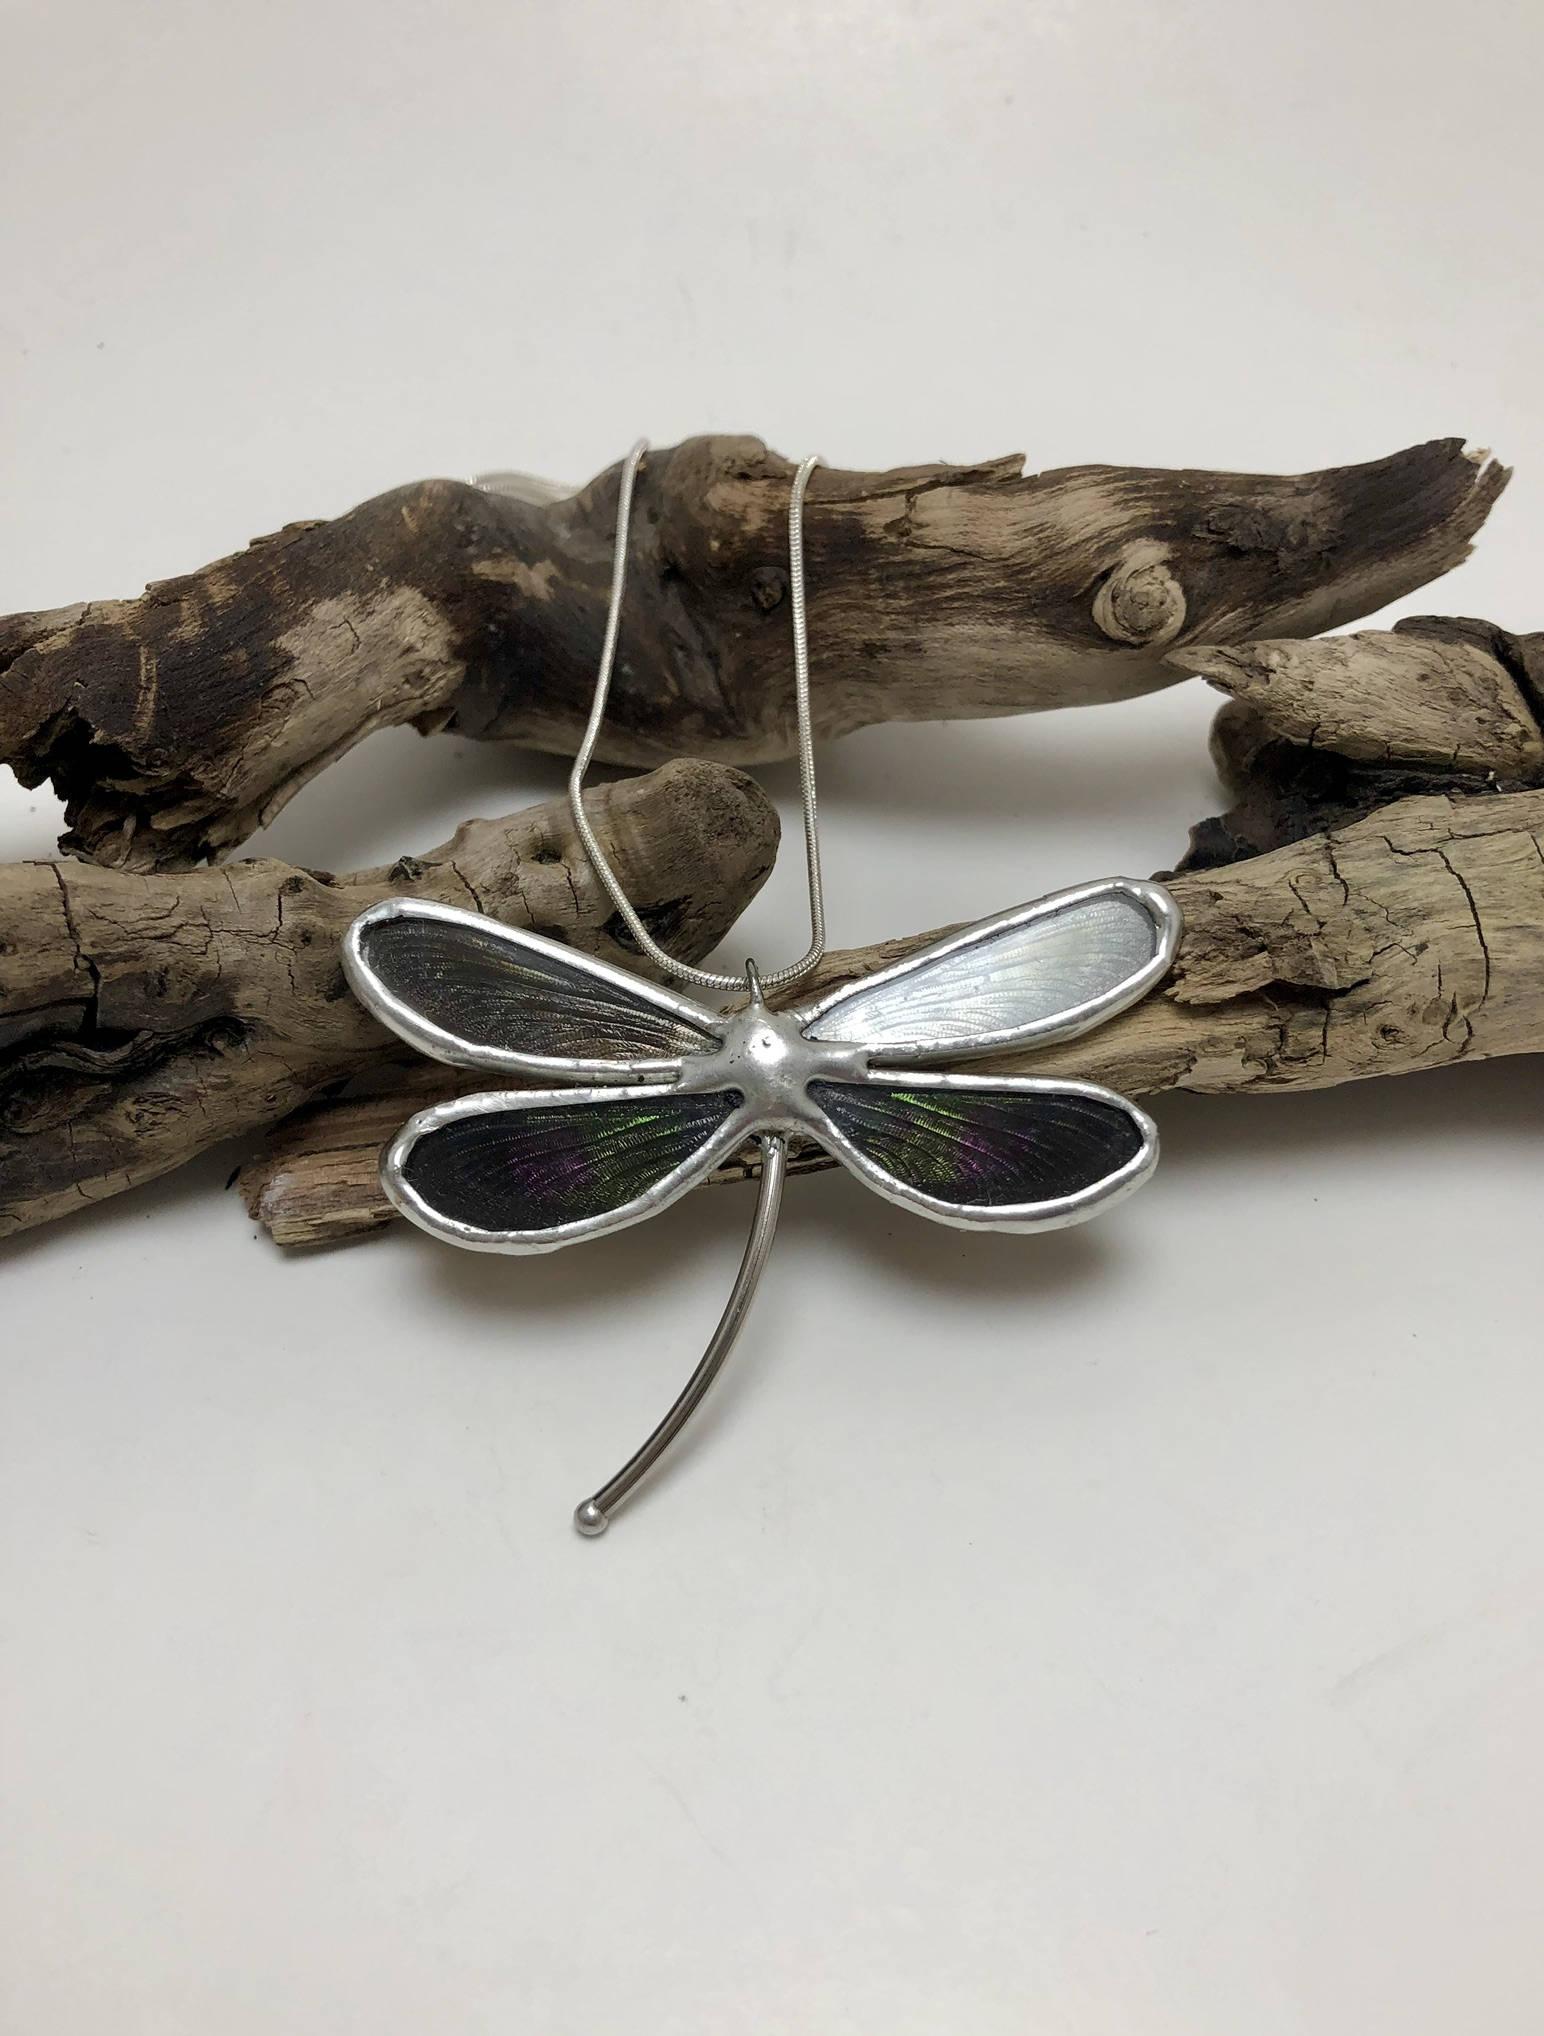 Real dragonfly jewelry, dragonfly jewelry, real butterfly jewelry ...